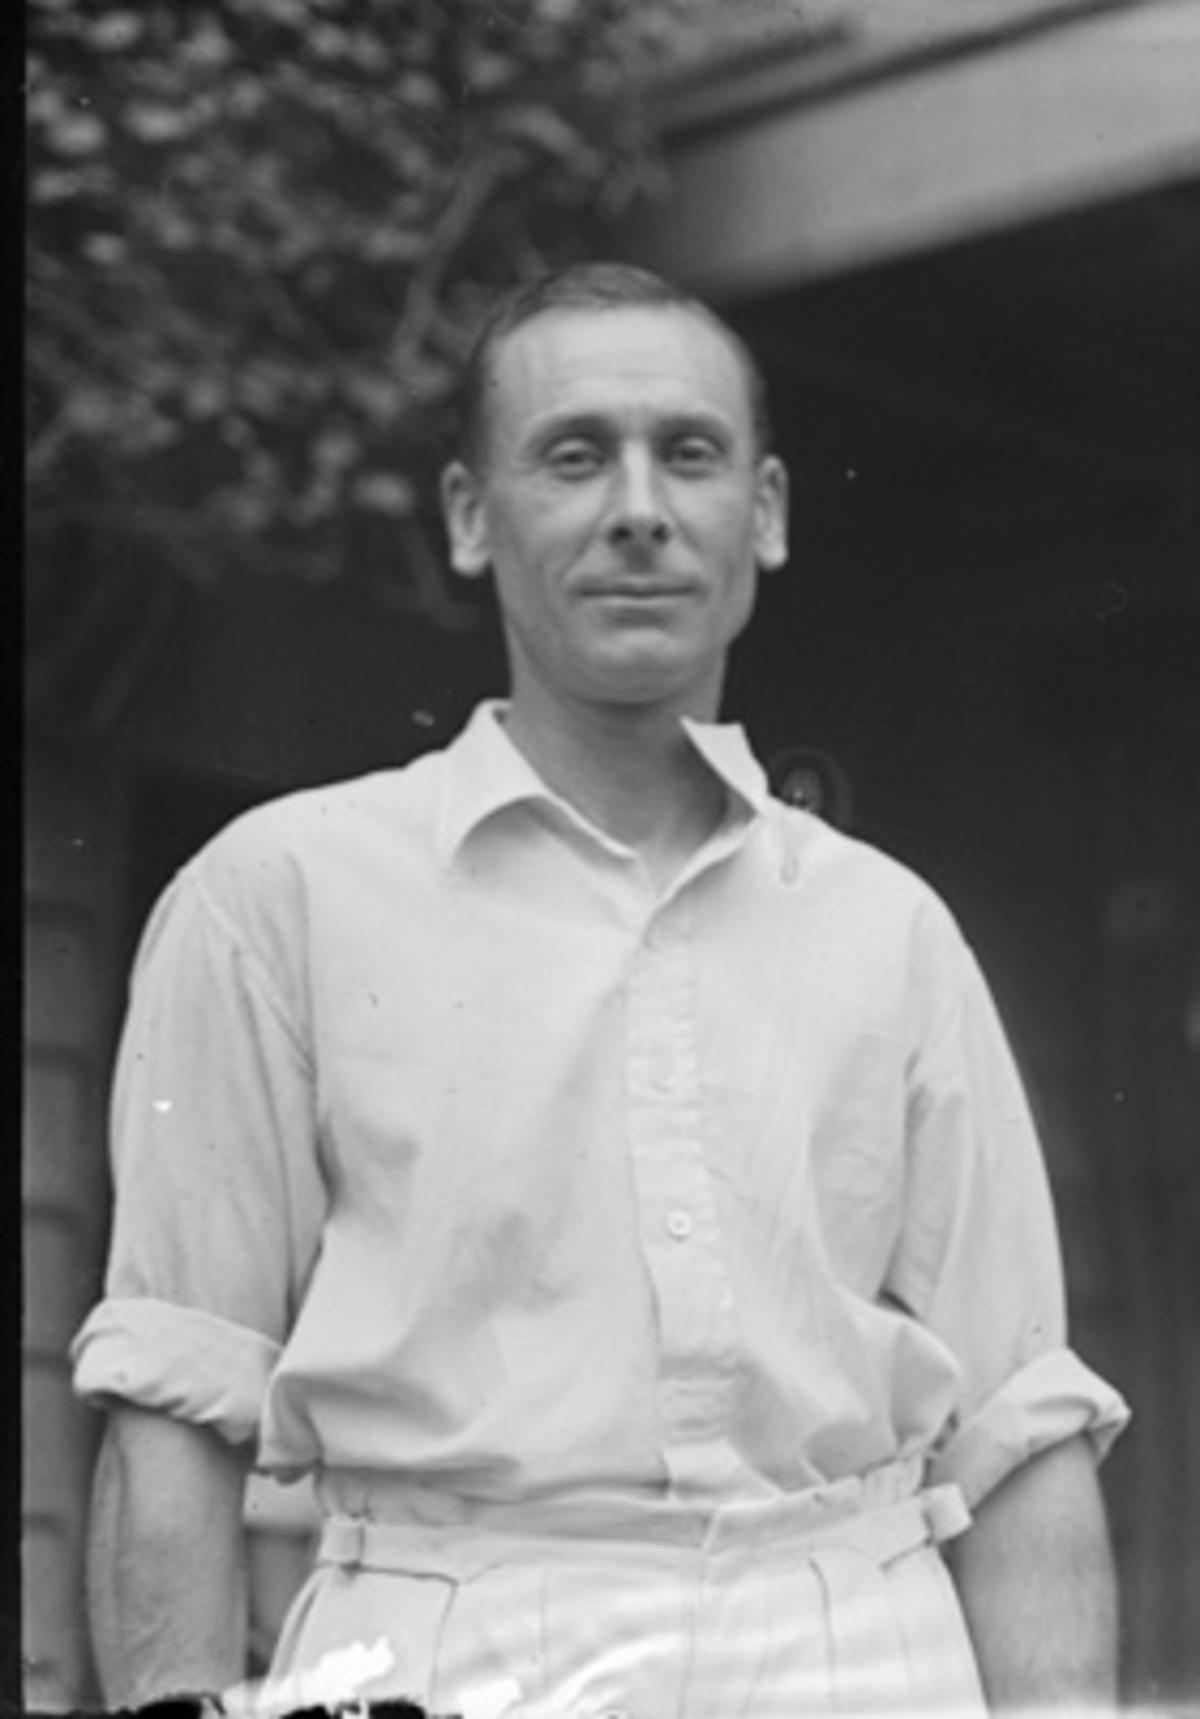 later cricket career of jack hobbs wikipedia